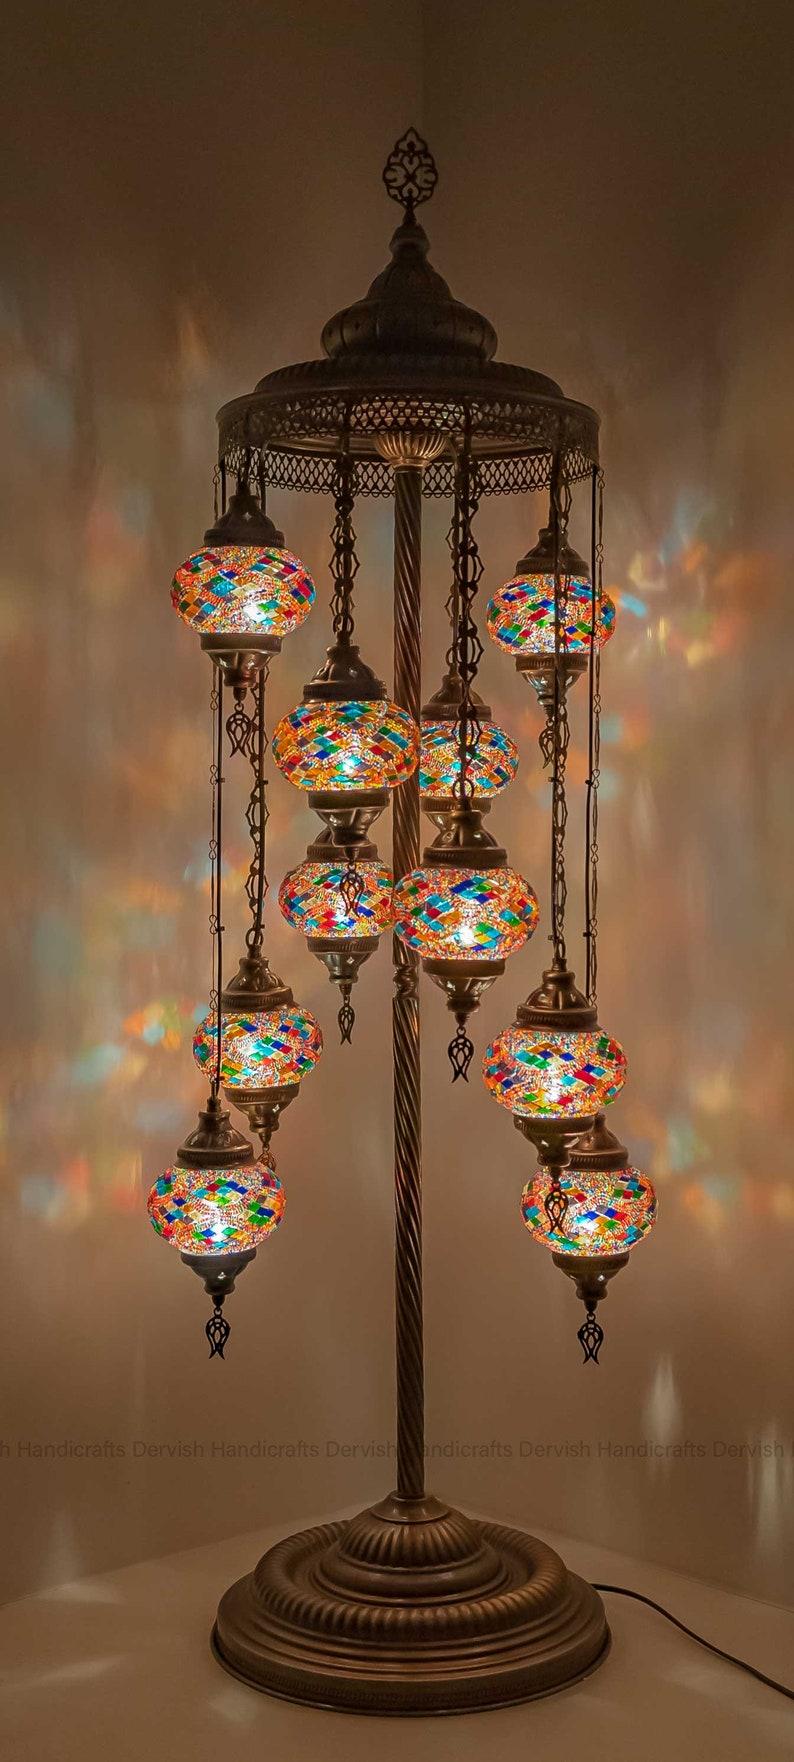 10 BALLS FLOOR Lamp Turkish Lamp Bedside Lamp Moroccan Lampshade 55 Height 5 Globes Diameter